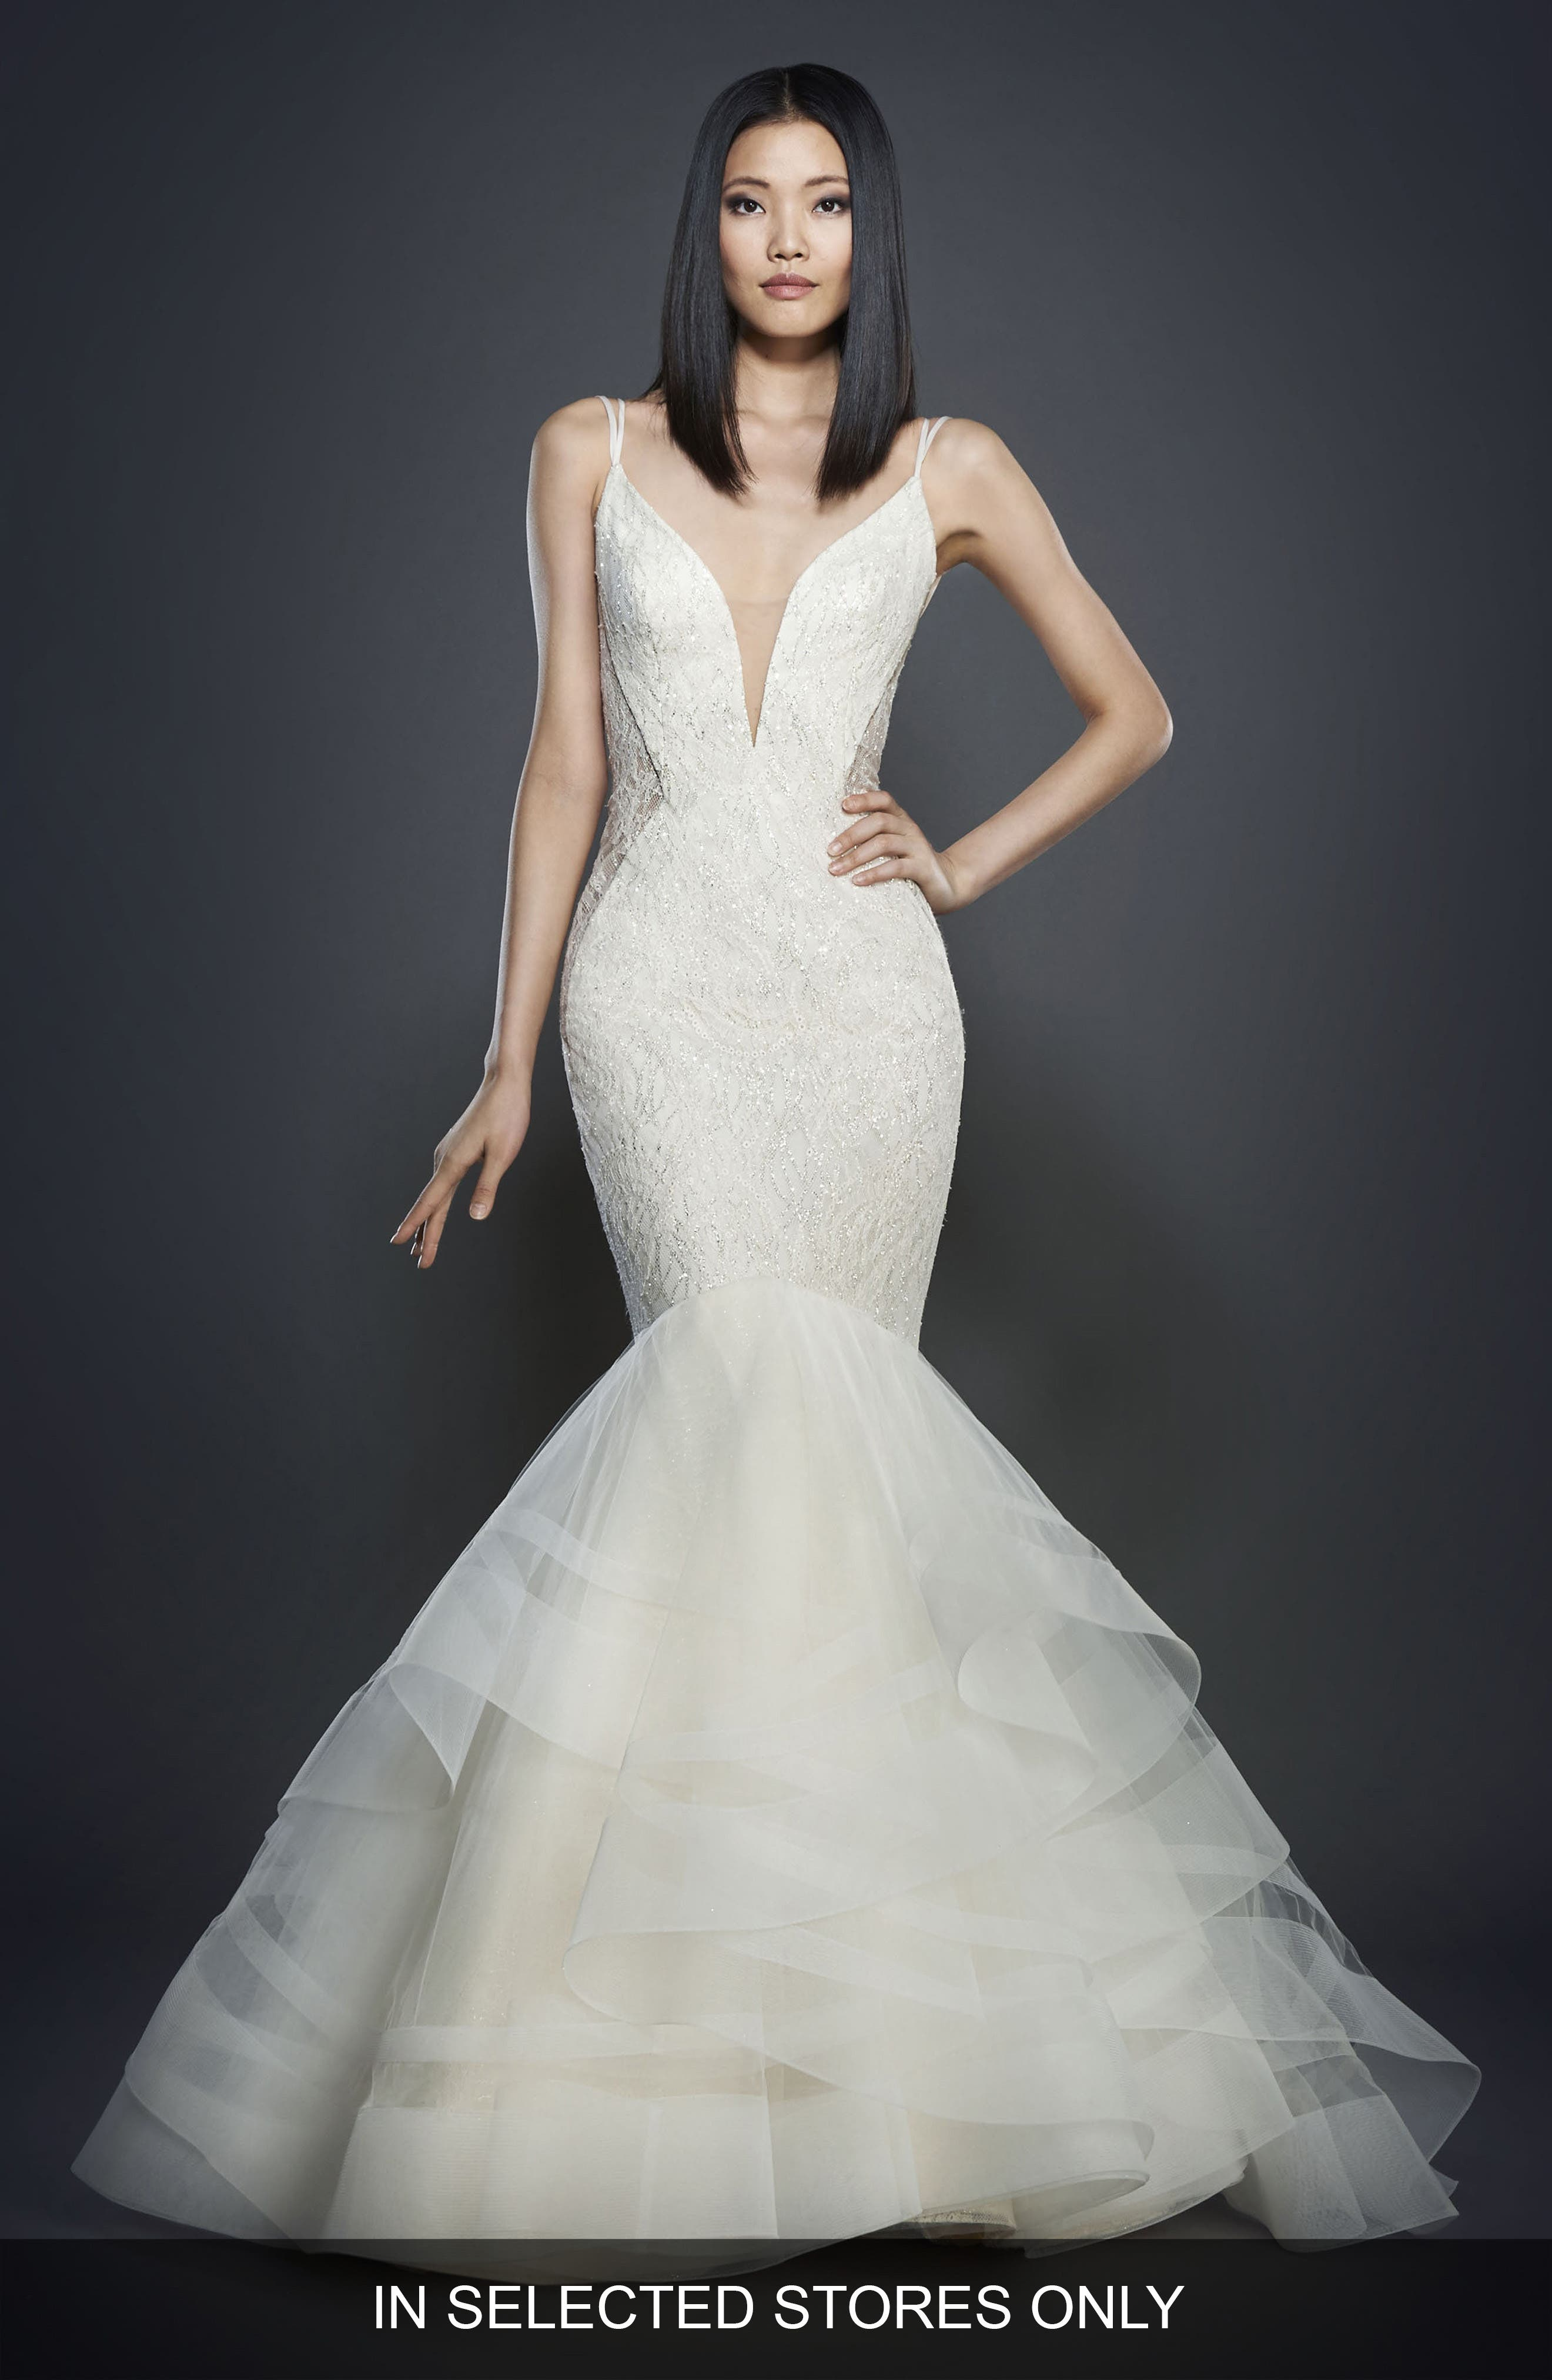 Lace Mermaid Dresses